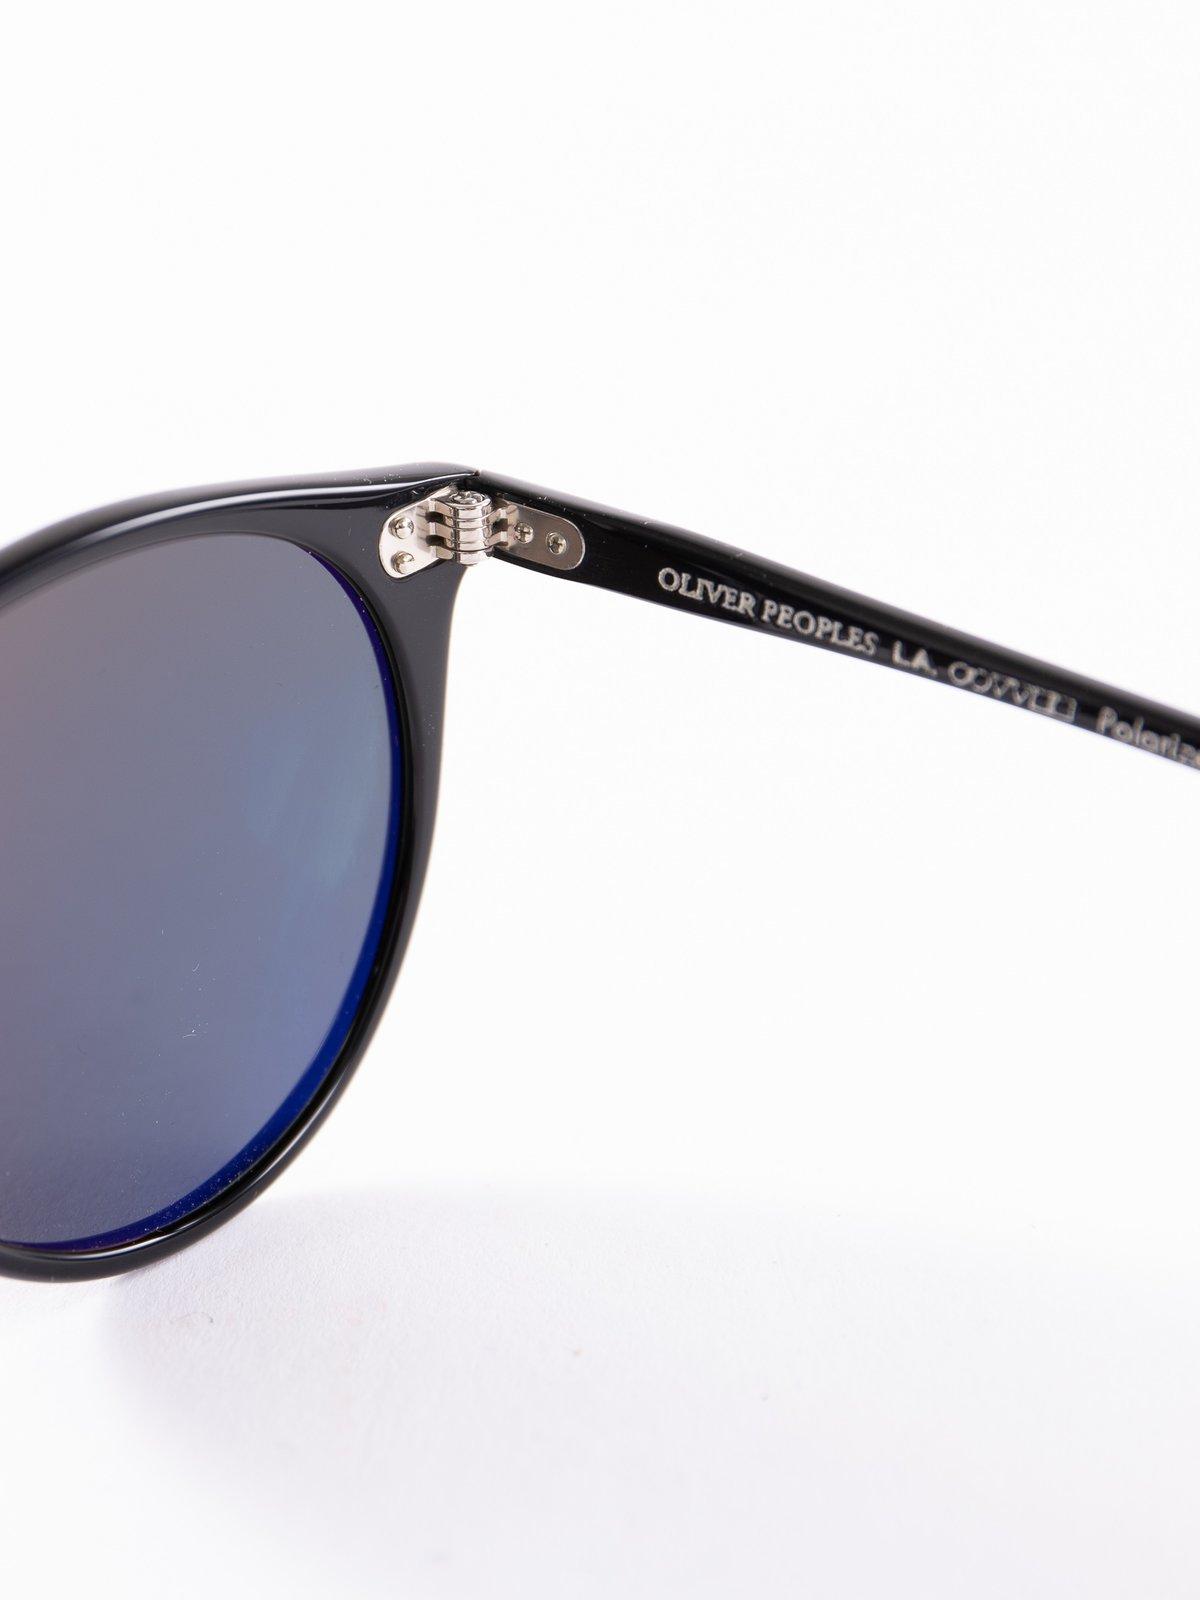 Black/Grey Polar O'Malley Sunglasses - Image 4